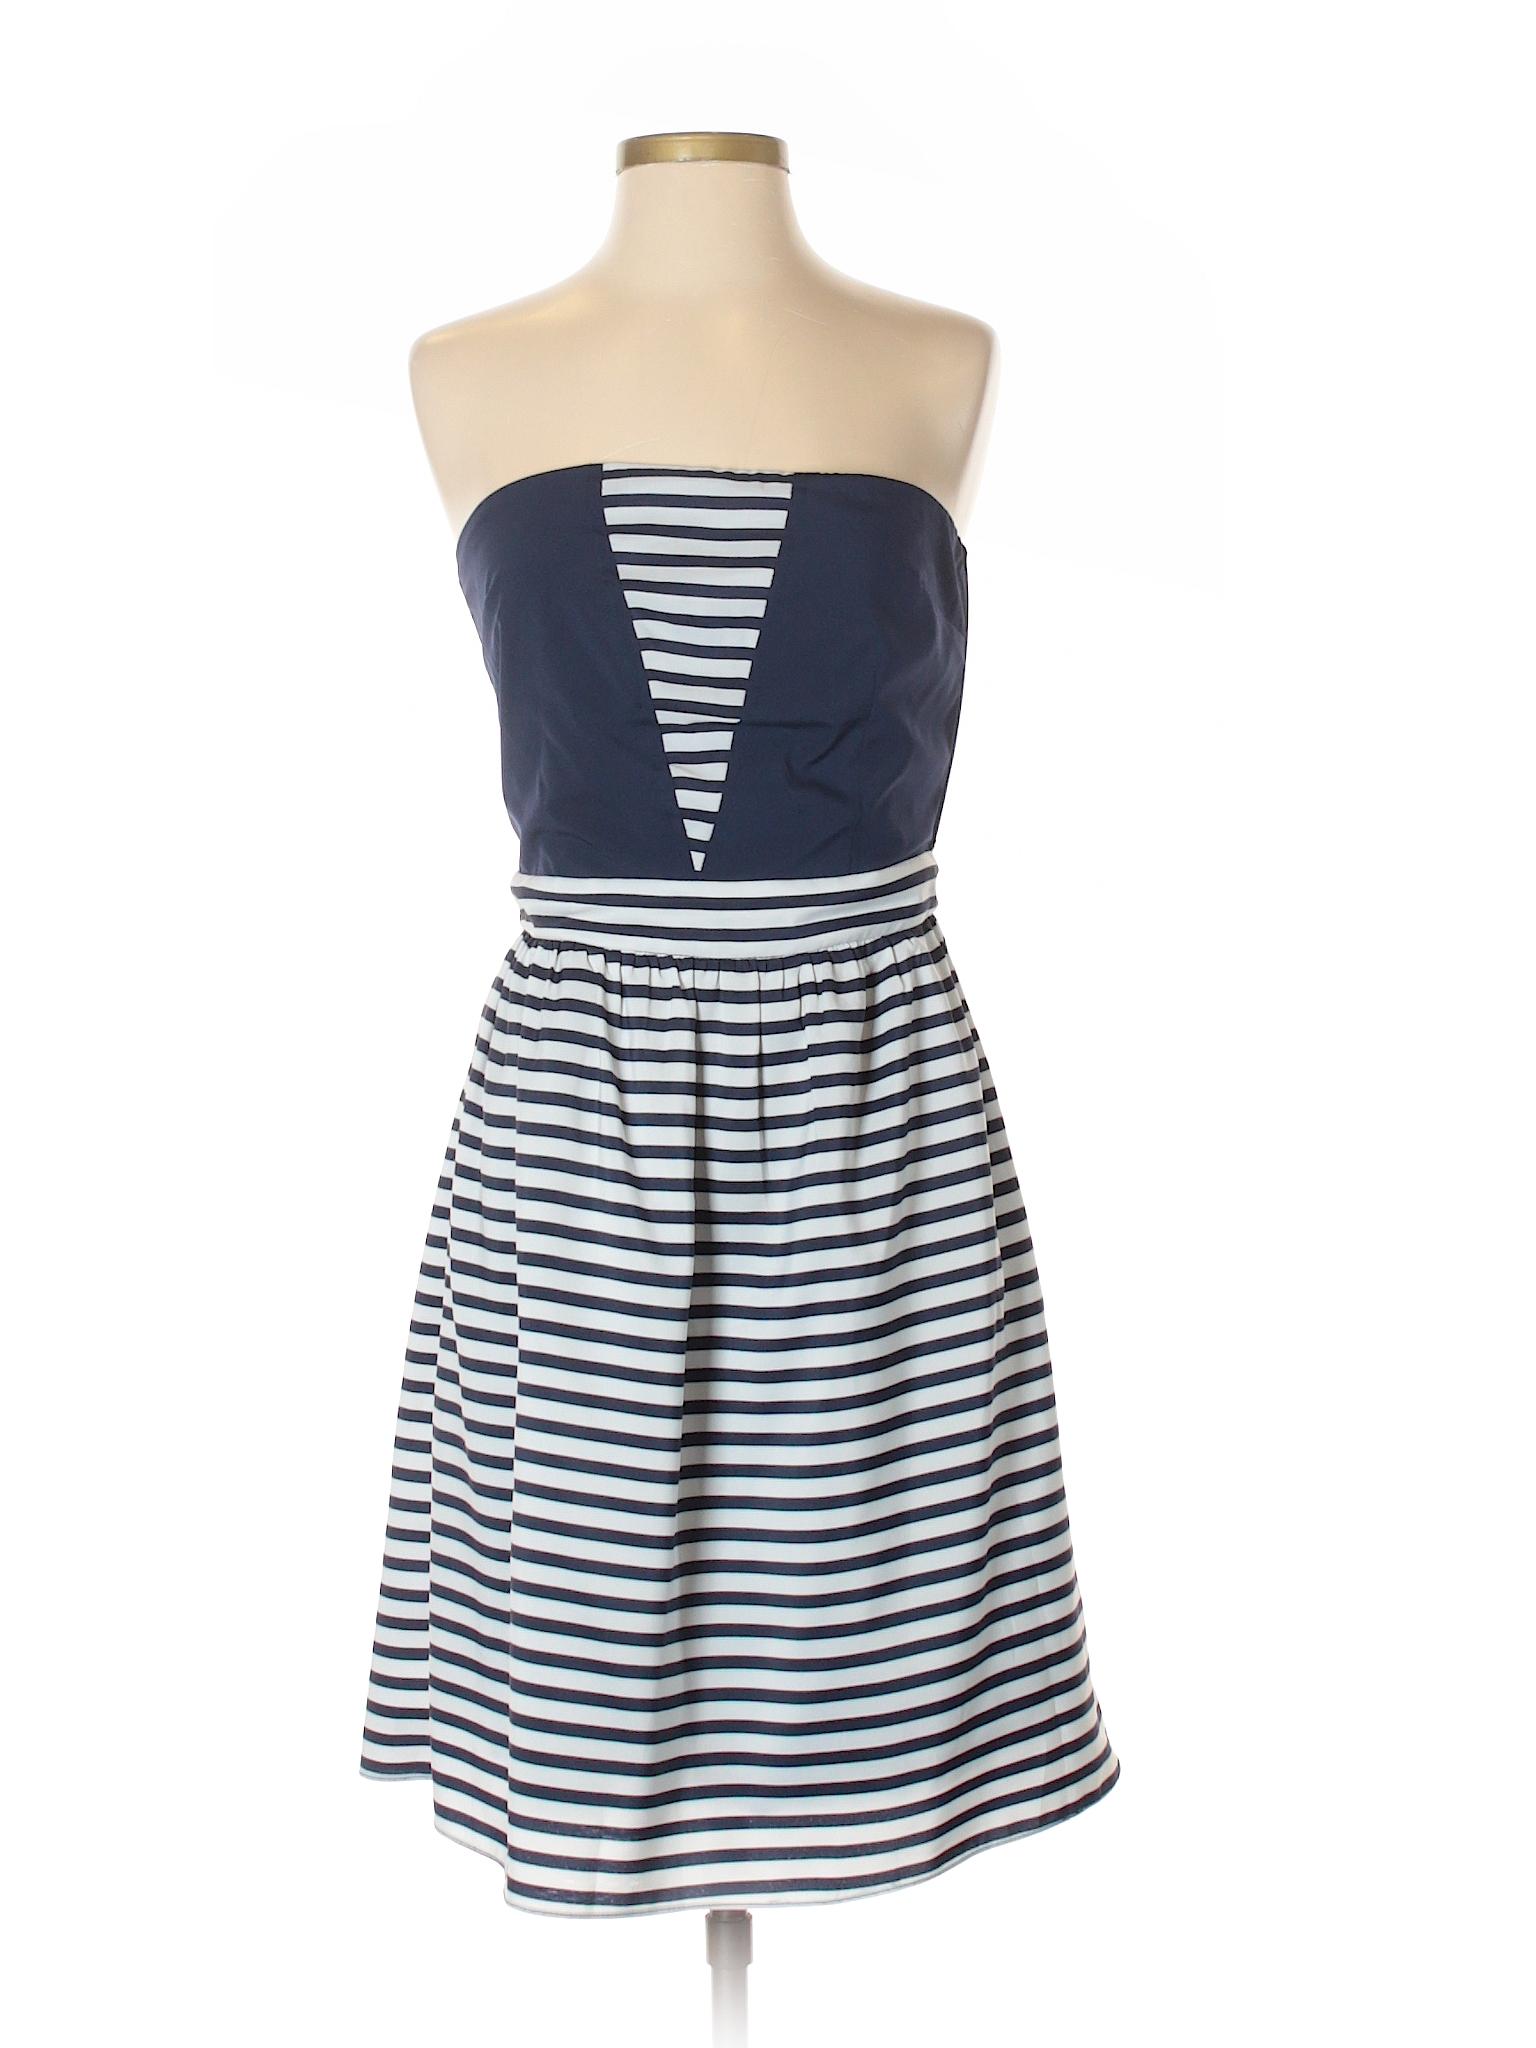 Dress Francesca's Boutique winter Boutique winter Francesca's Casual Casual qw80B